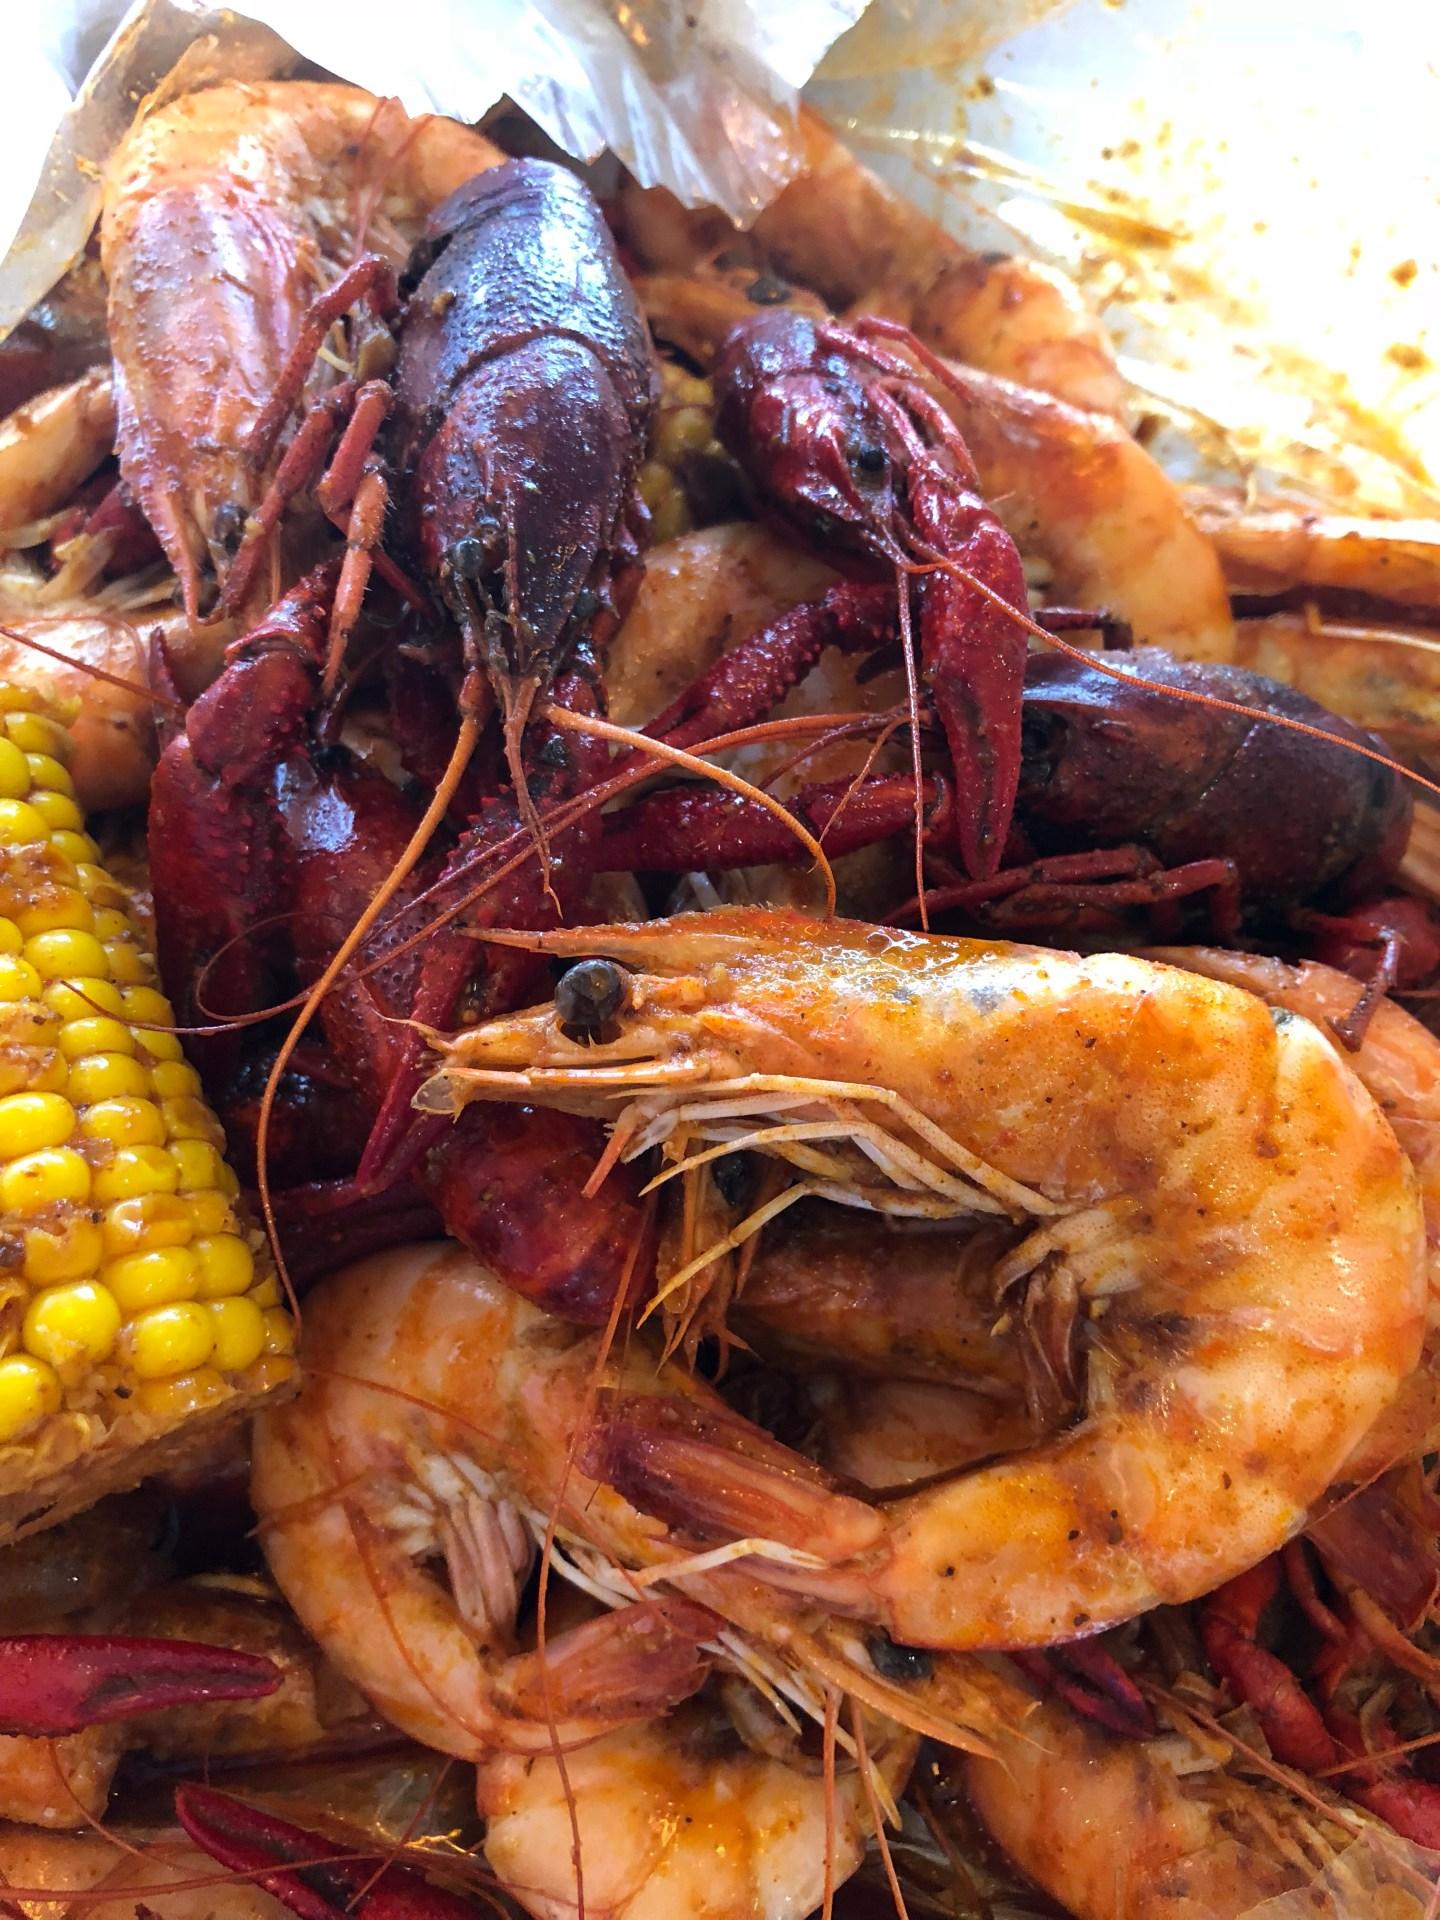 Gardena, CA: The Crab Shack